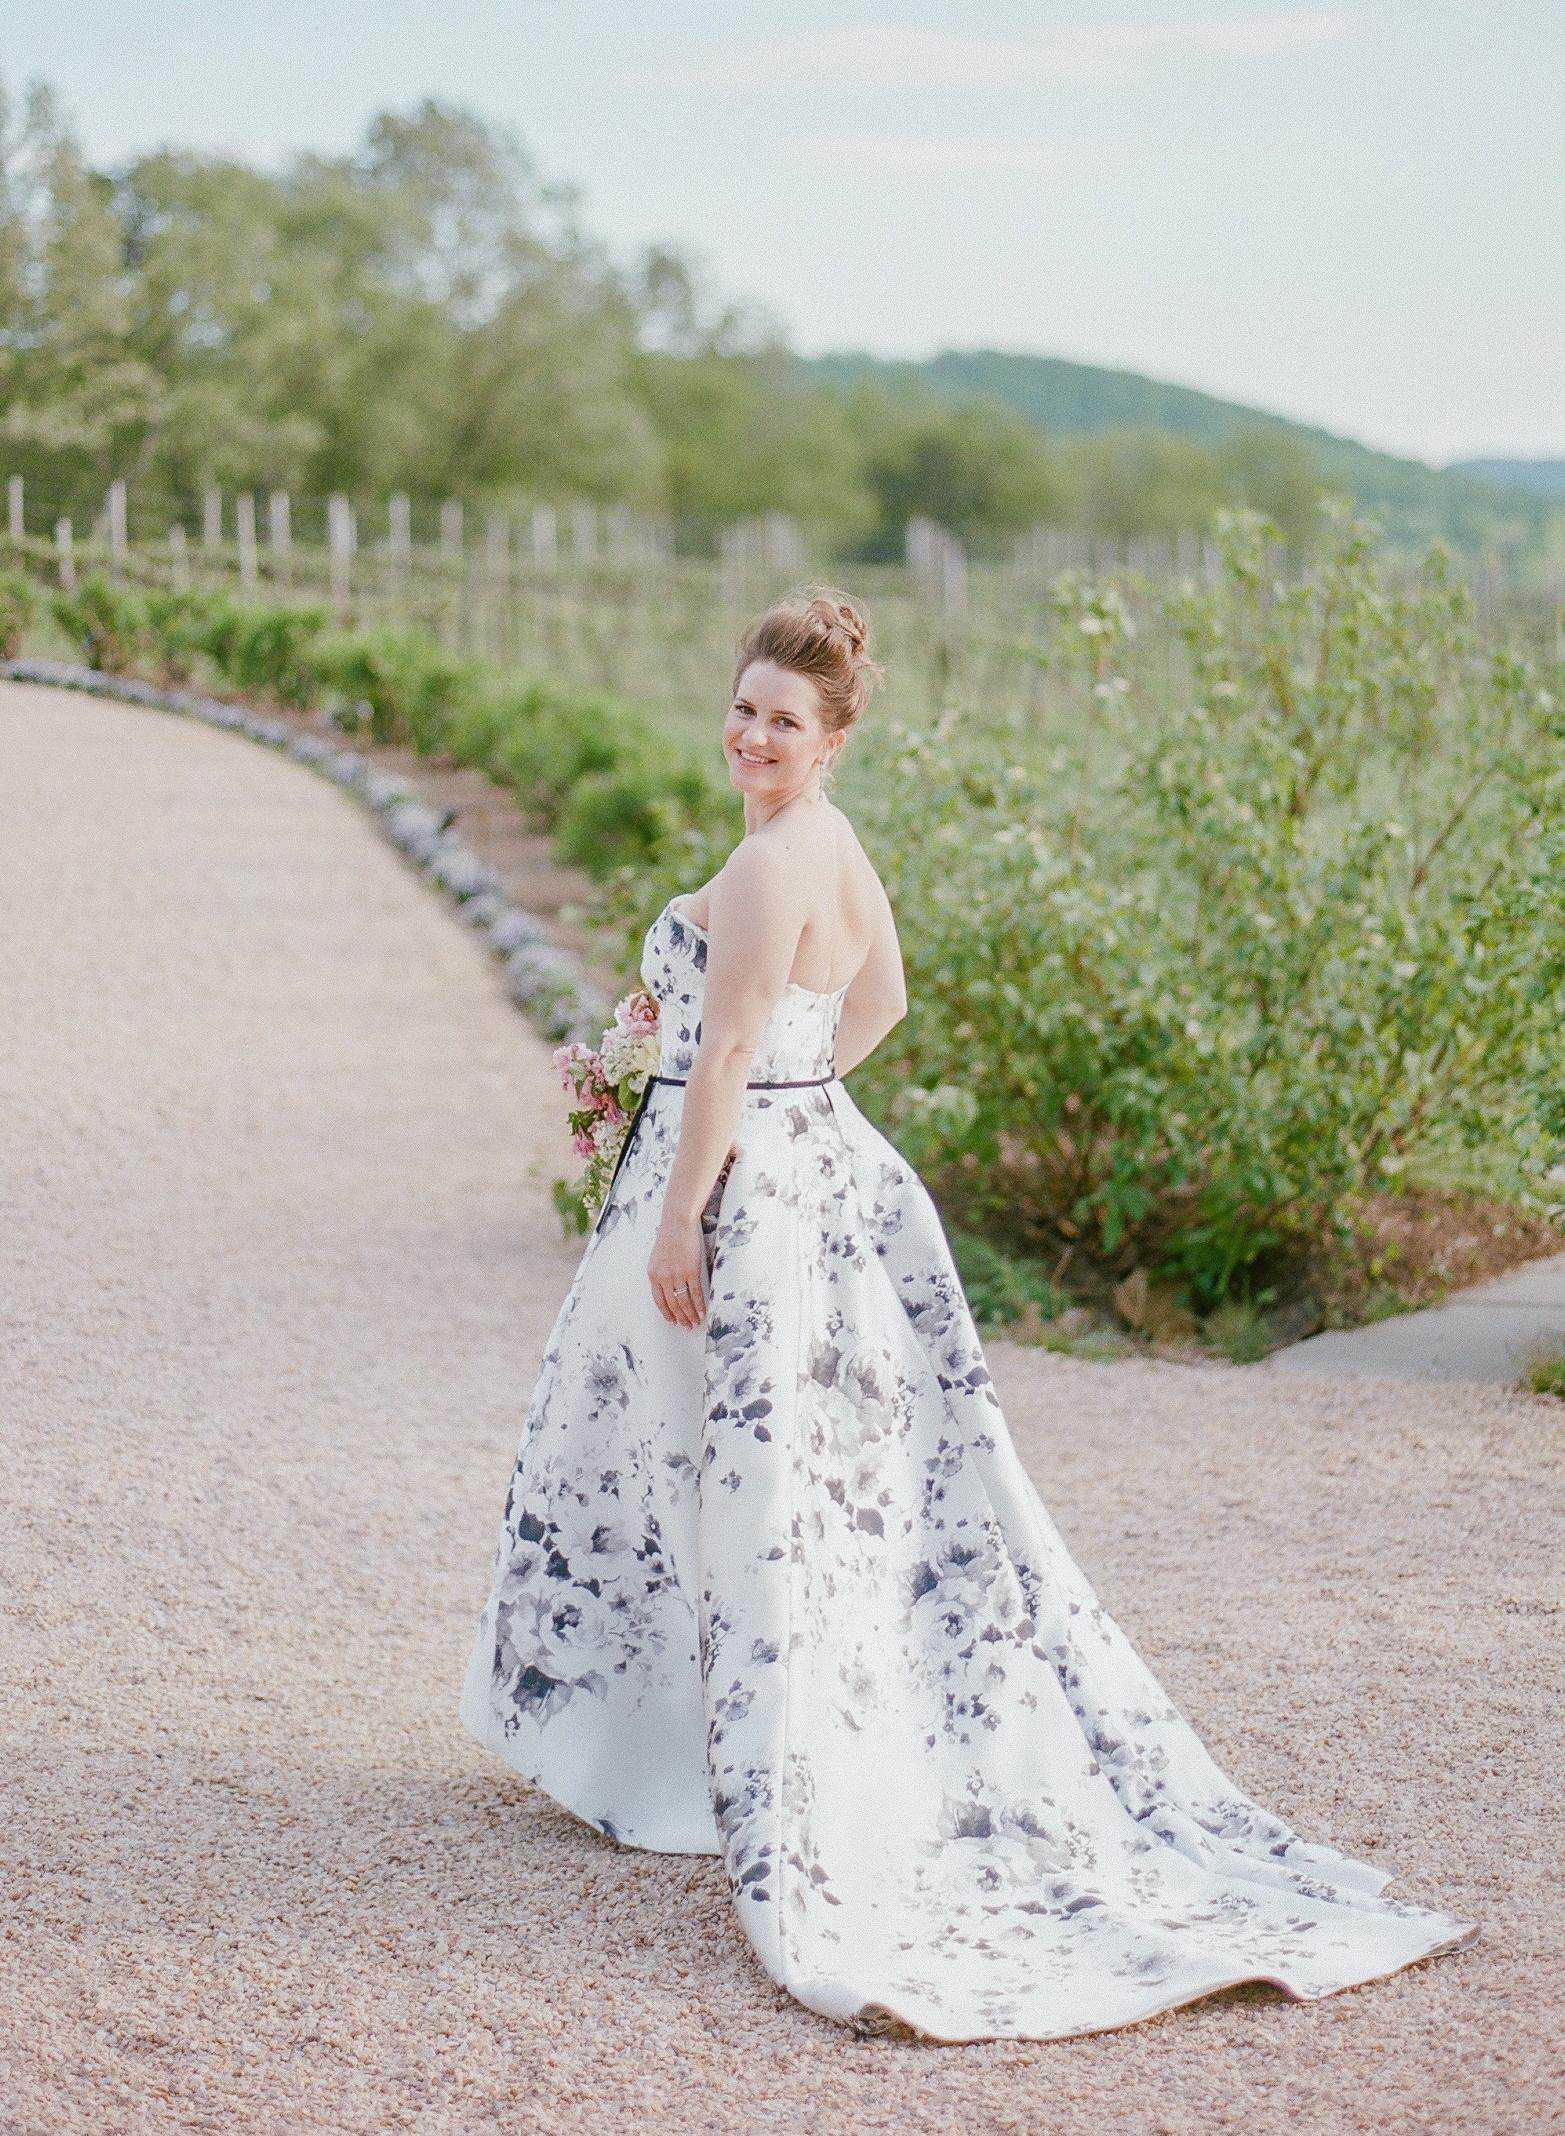 mechelle julia wedding bride floral dress